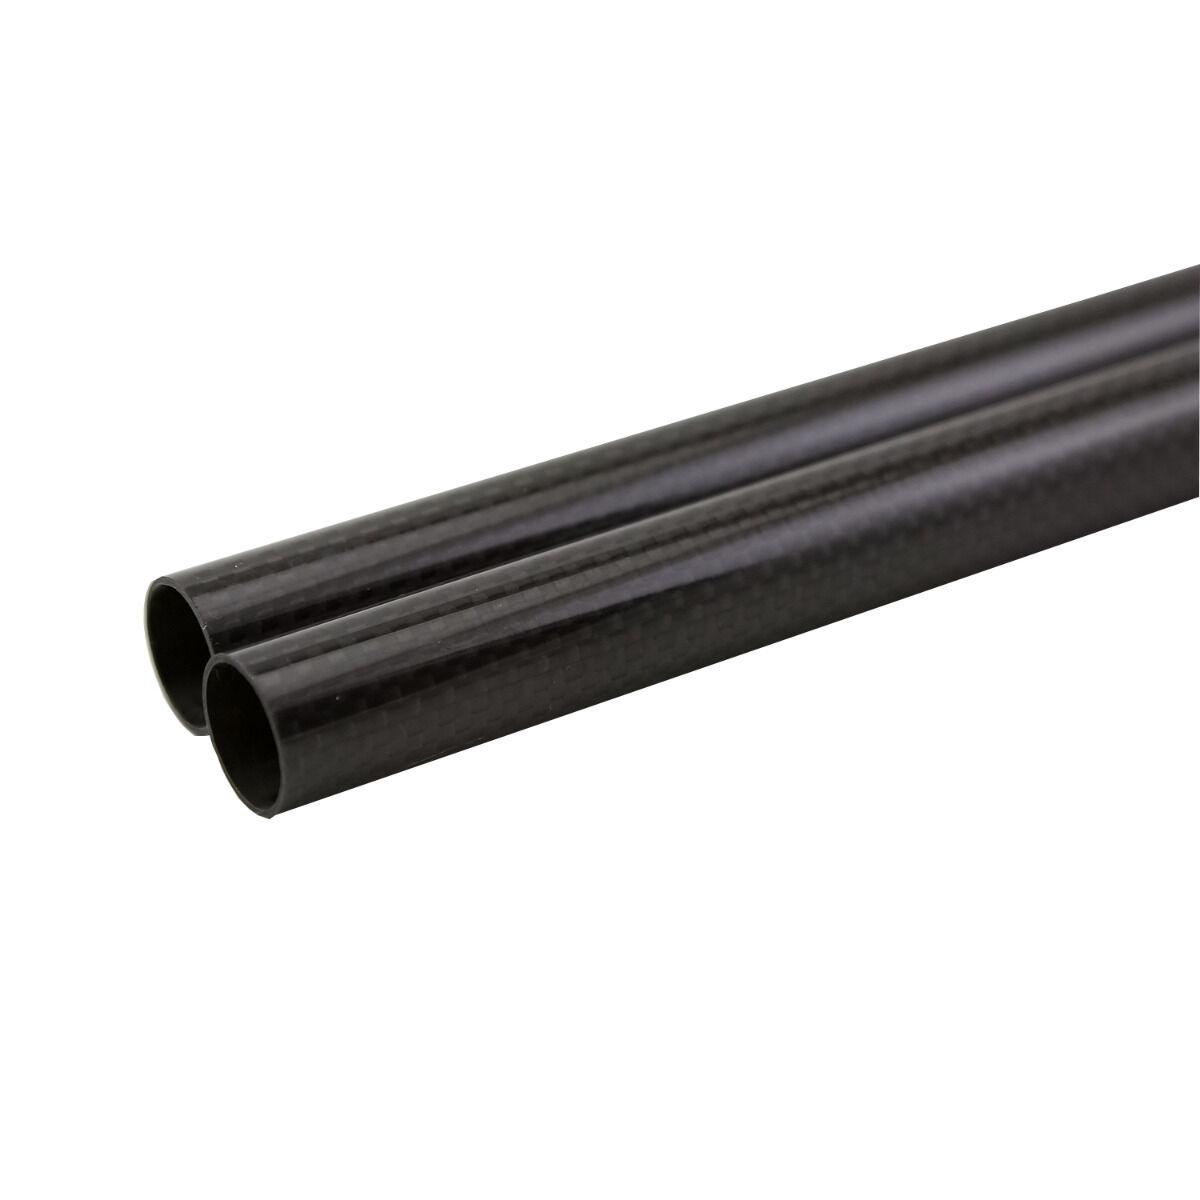 2Pcs 3K ROTOLO avvolto 50 mm Carbon Fiber Tube 46 mm x 50 mm x 500 mm LUCIDO OPACO QUAD